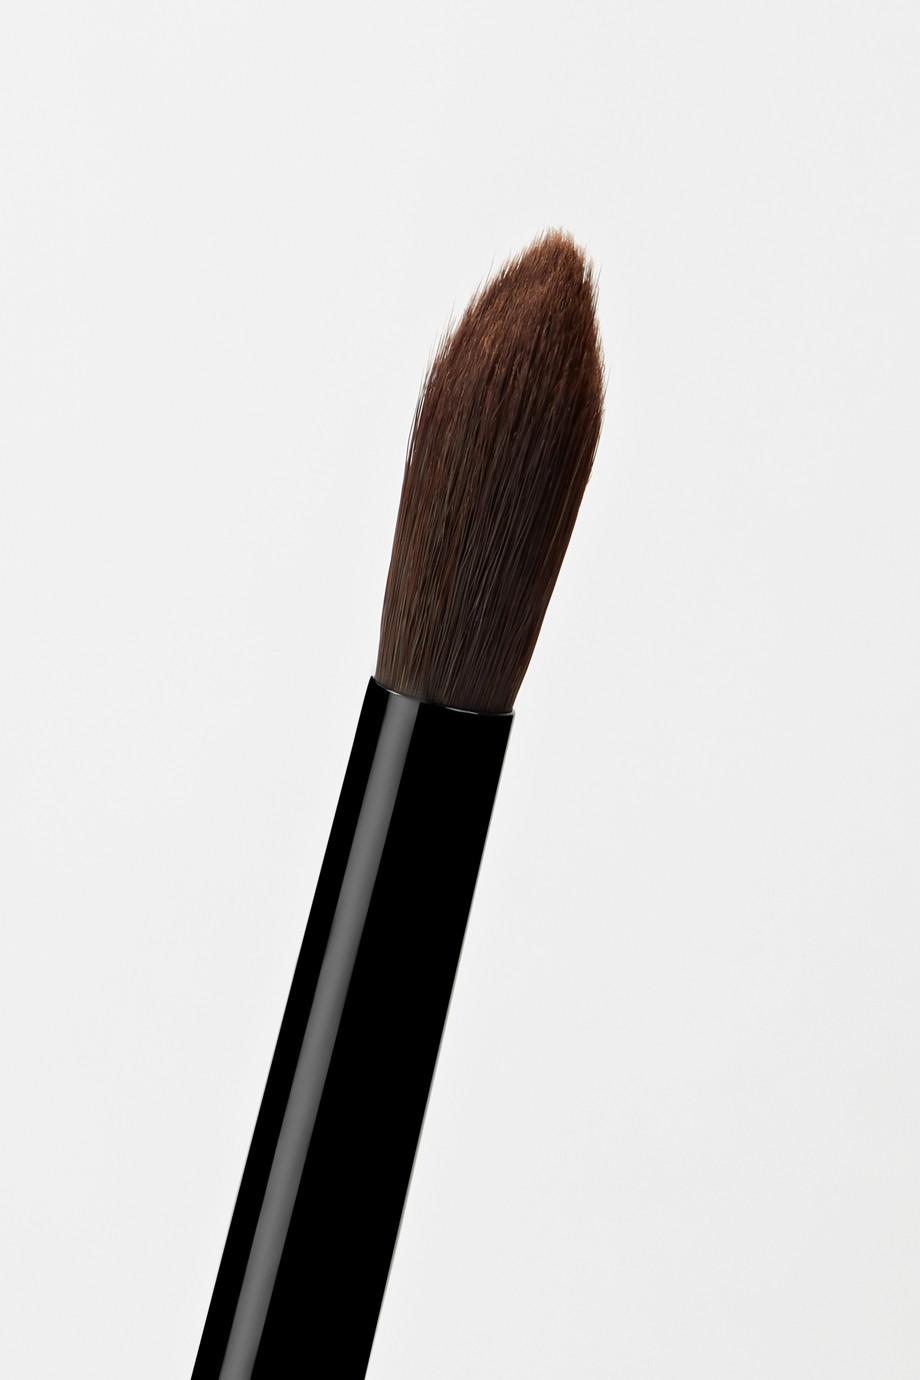 Rae Morris Jishaku 7 Vegan Deluxe Point Shader Brush – Lidschattenpinsel